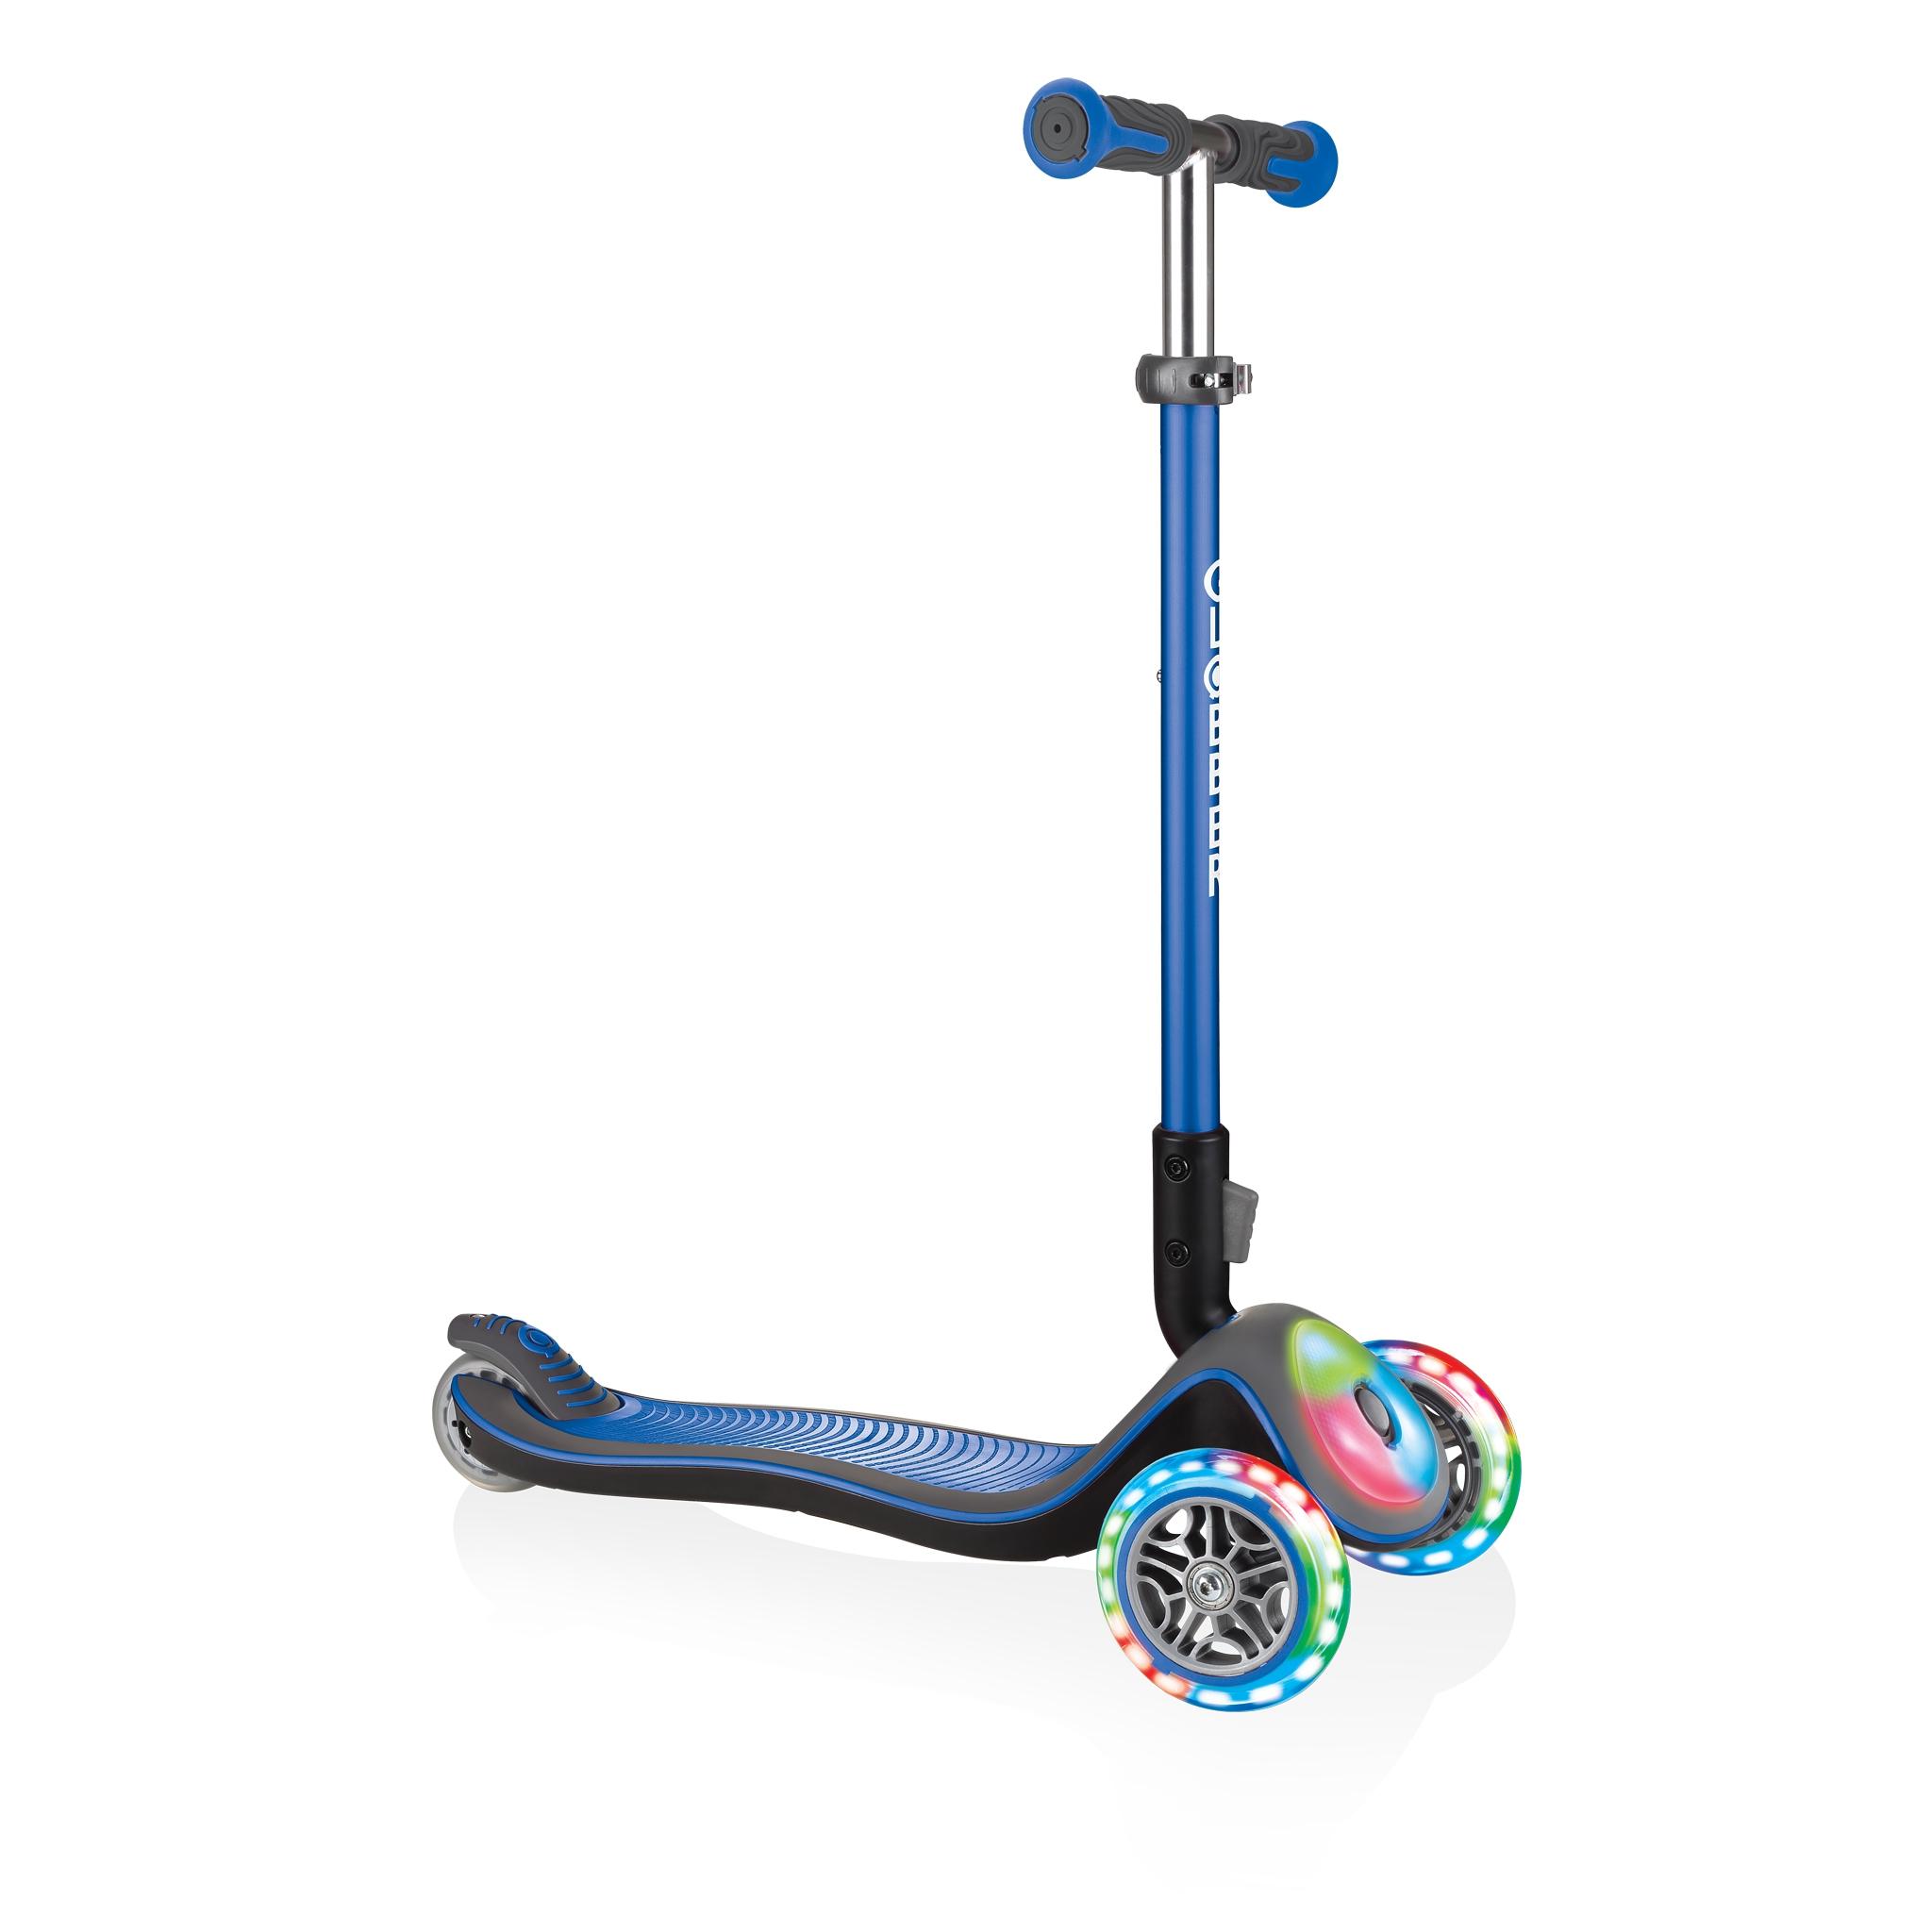 Globber-ELITE-DELUXE-FLASH-LIGHTS-3-wheel-light-up-scooter-for-kids-aged-3+-navy-blue